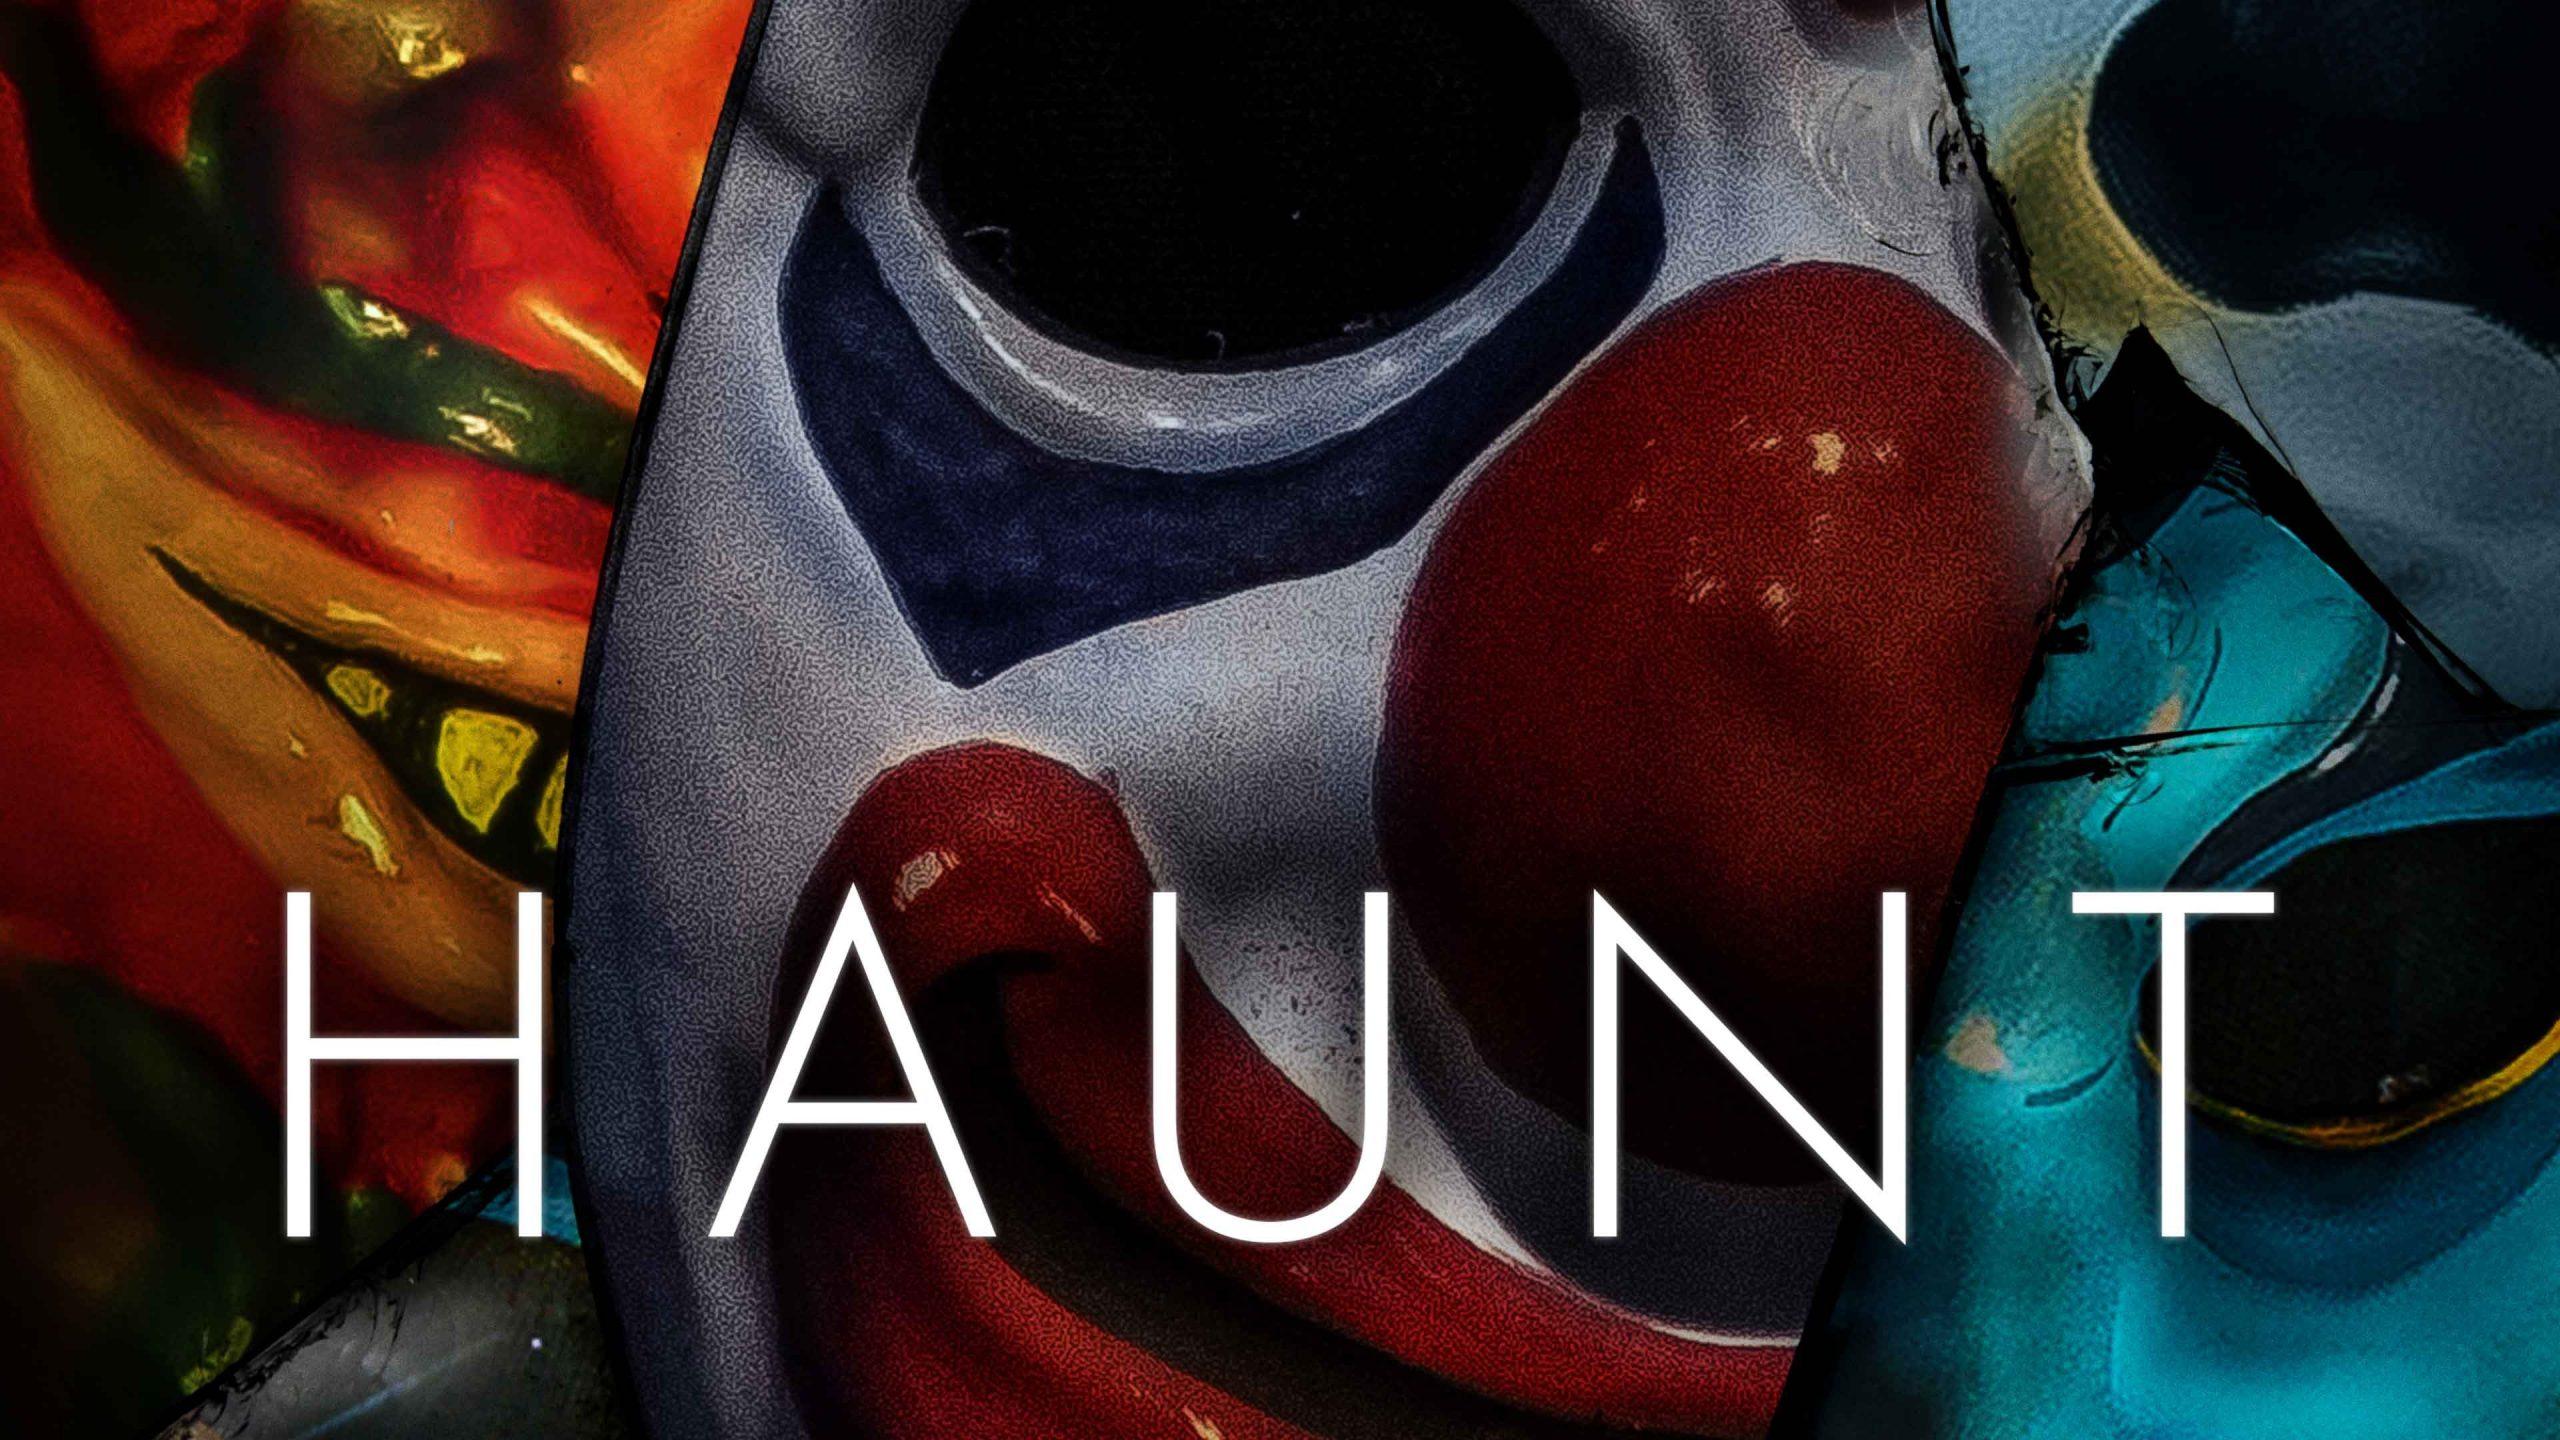 Review: Haunt (2019)